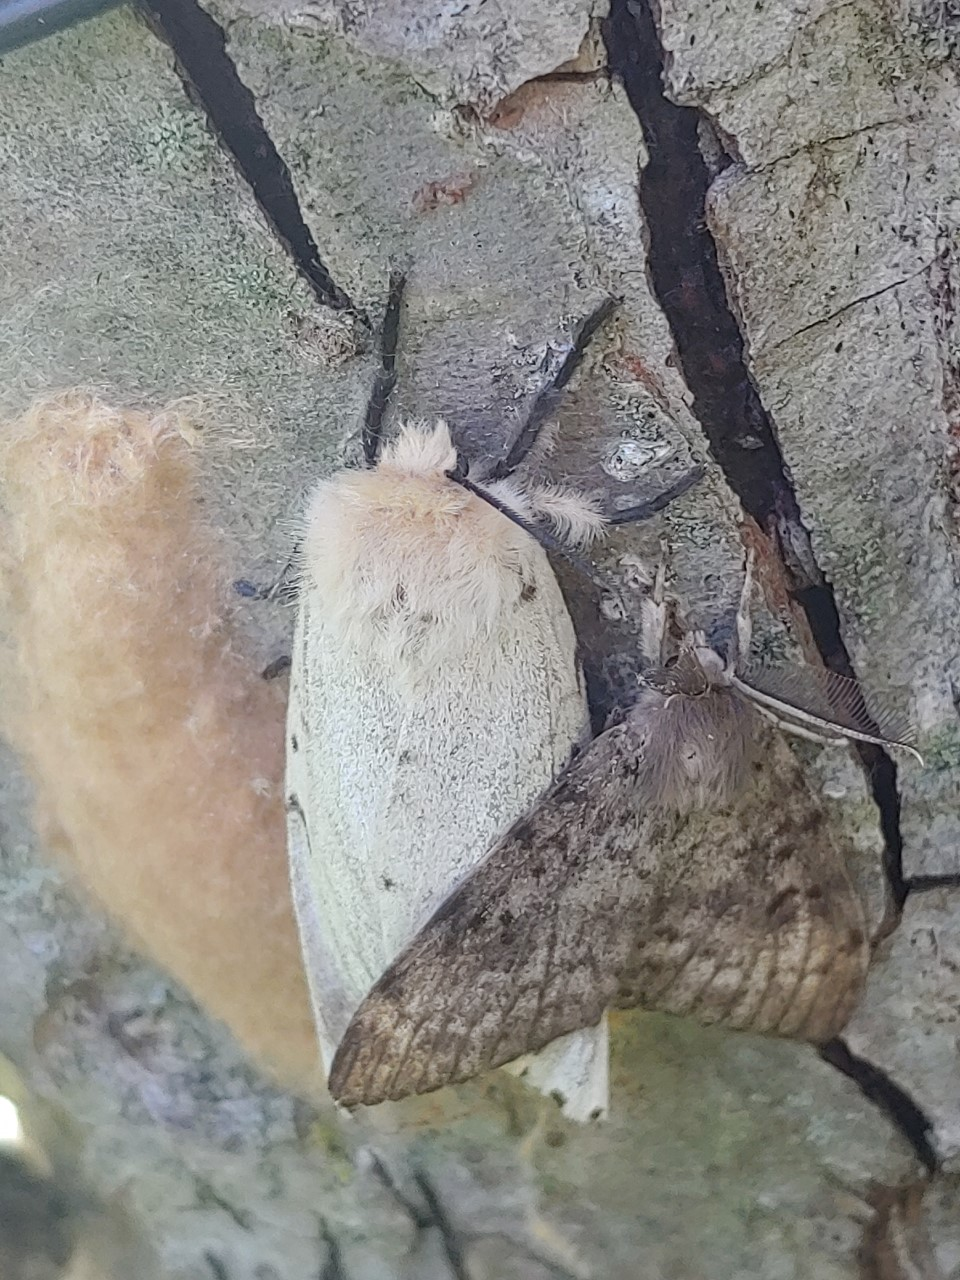 Egg Mass, Female Gypsy Moth (White) and Male Gypsy Moth (Brown)